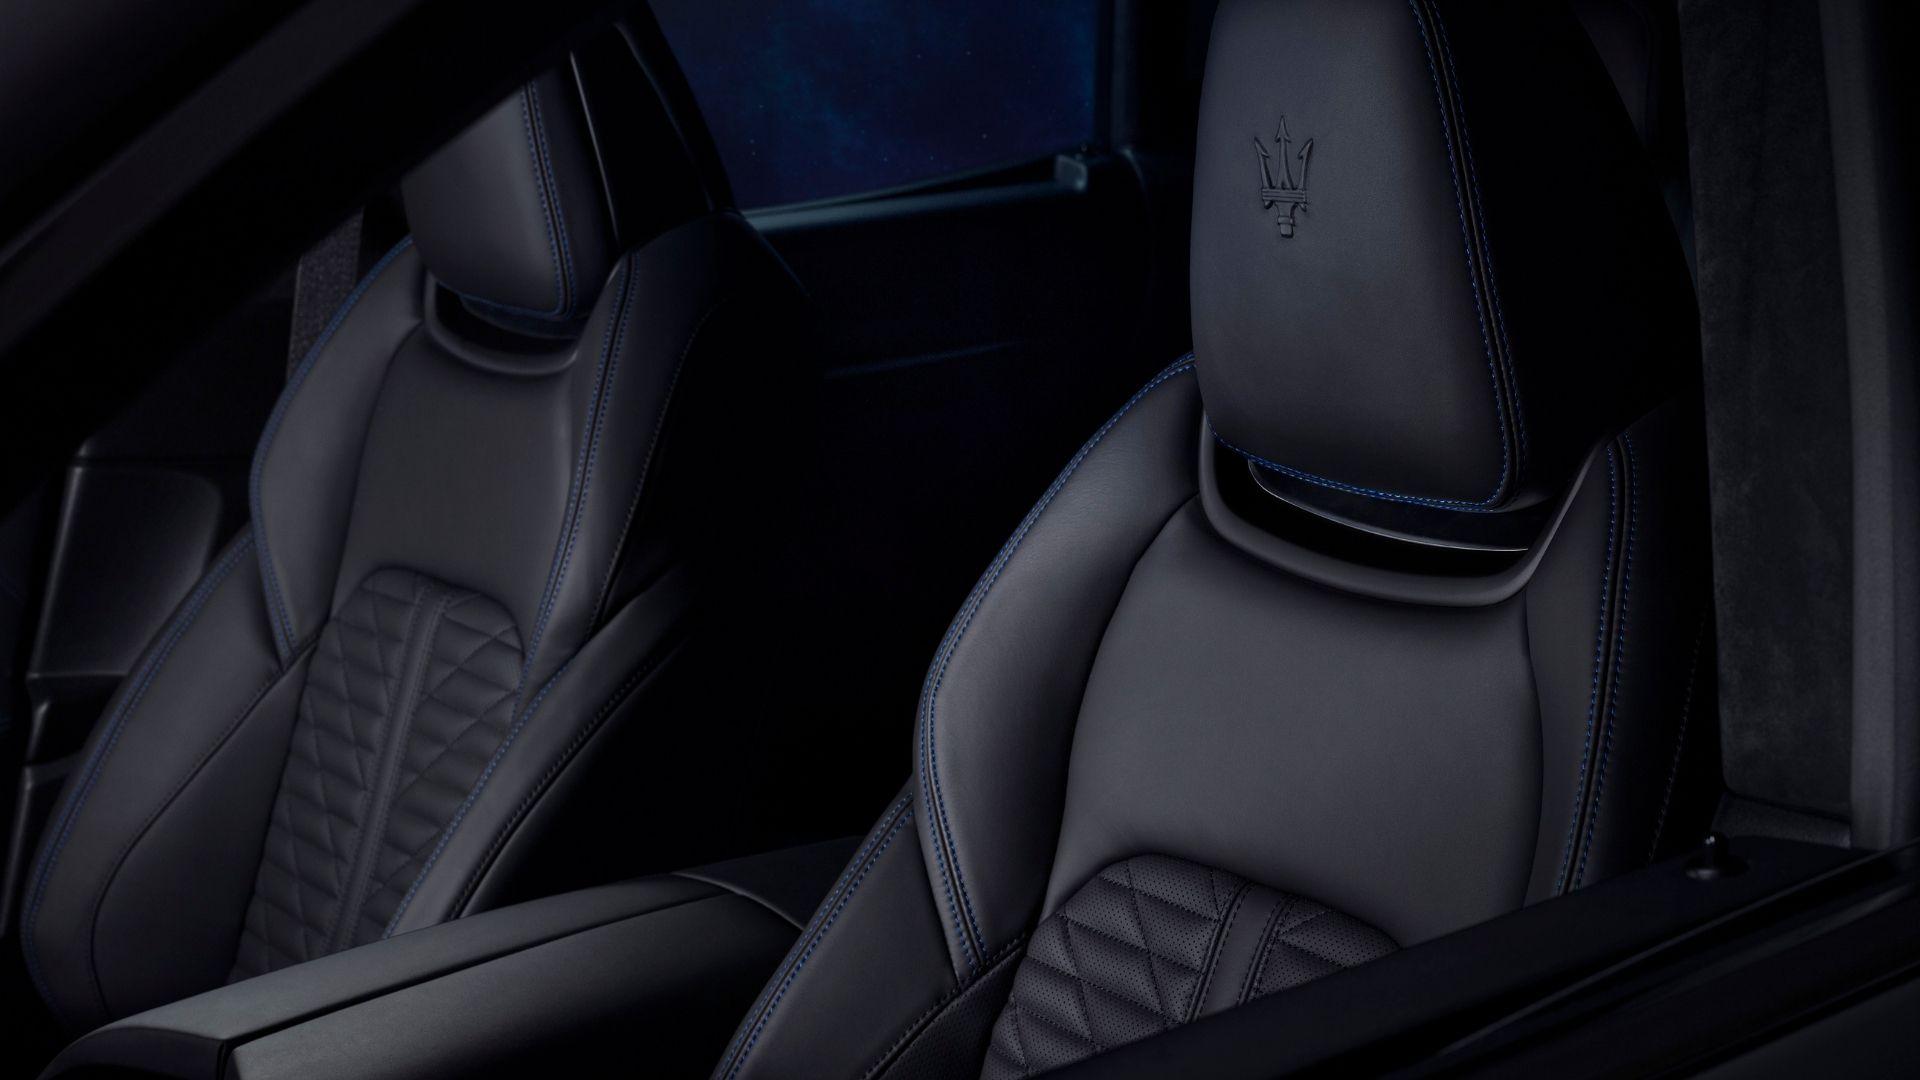 Maserati-Levante-Hybrid-sedili